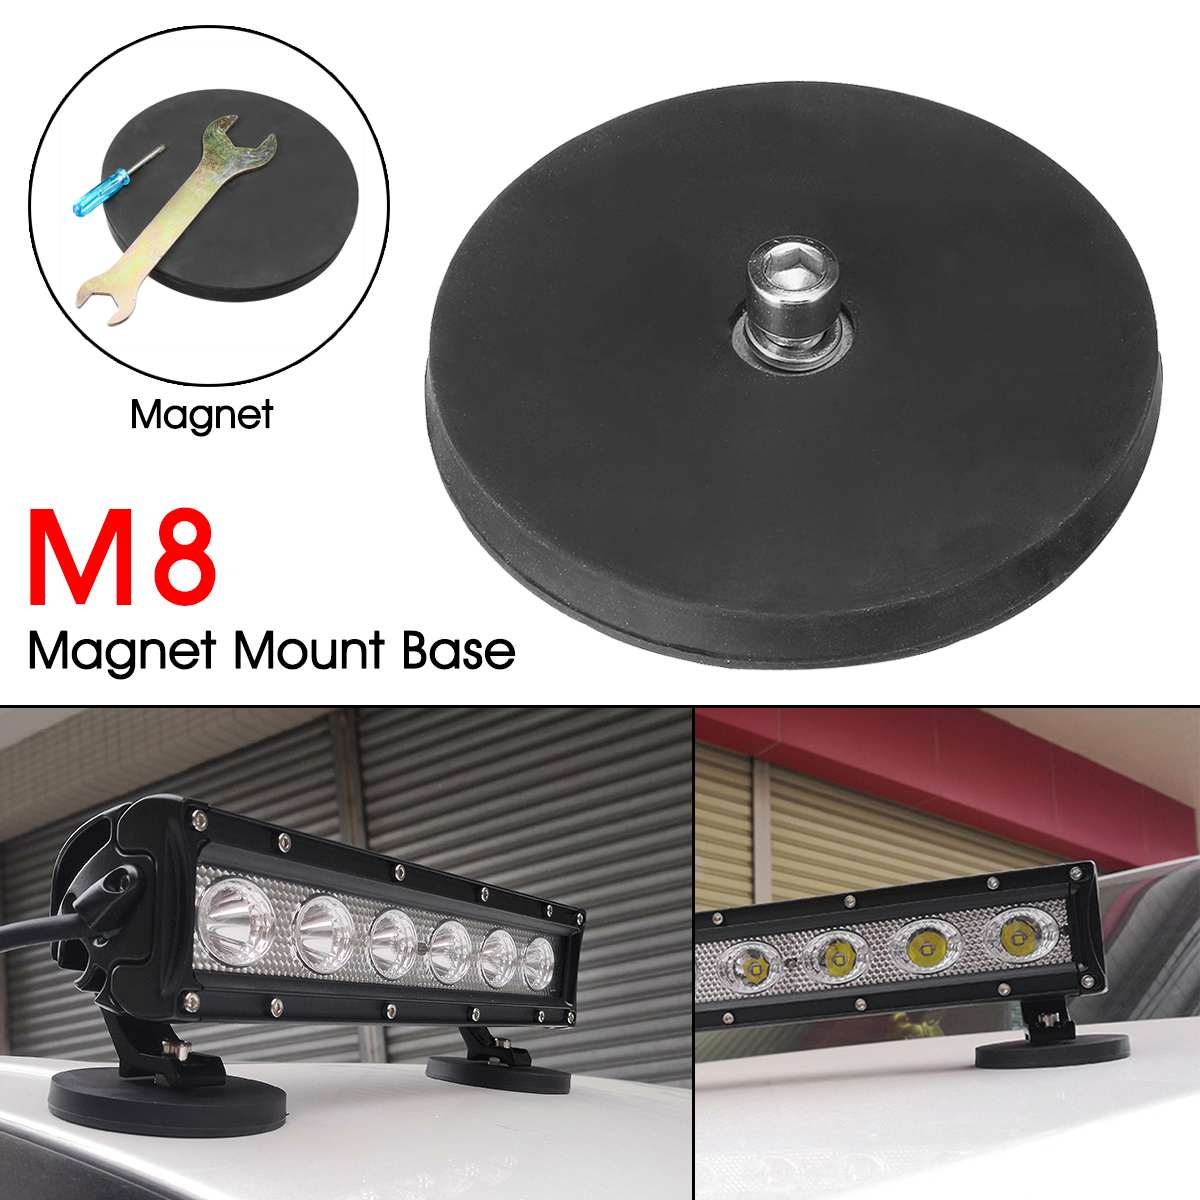 Car LED Work Light Bar Strong Magnet Base Mounting Bracket Holder w/Rubber Pad For SUV Trucks BoatCar LED Work Light Bar Strong Magnet Base Mounting Bracket Holder w/Rubber Pad For SUV Trucks Boat